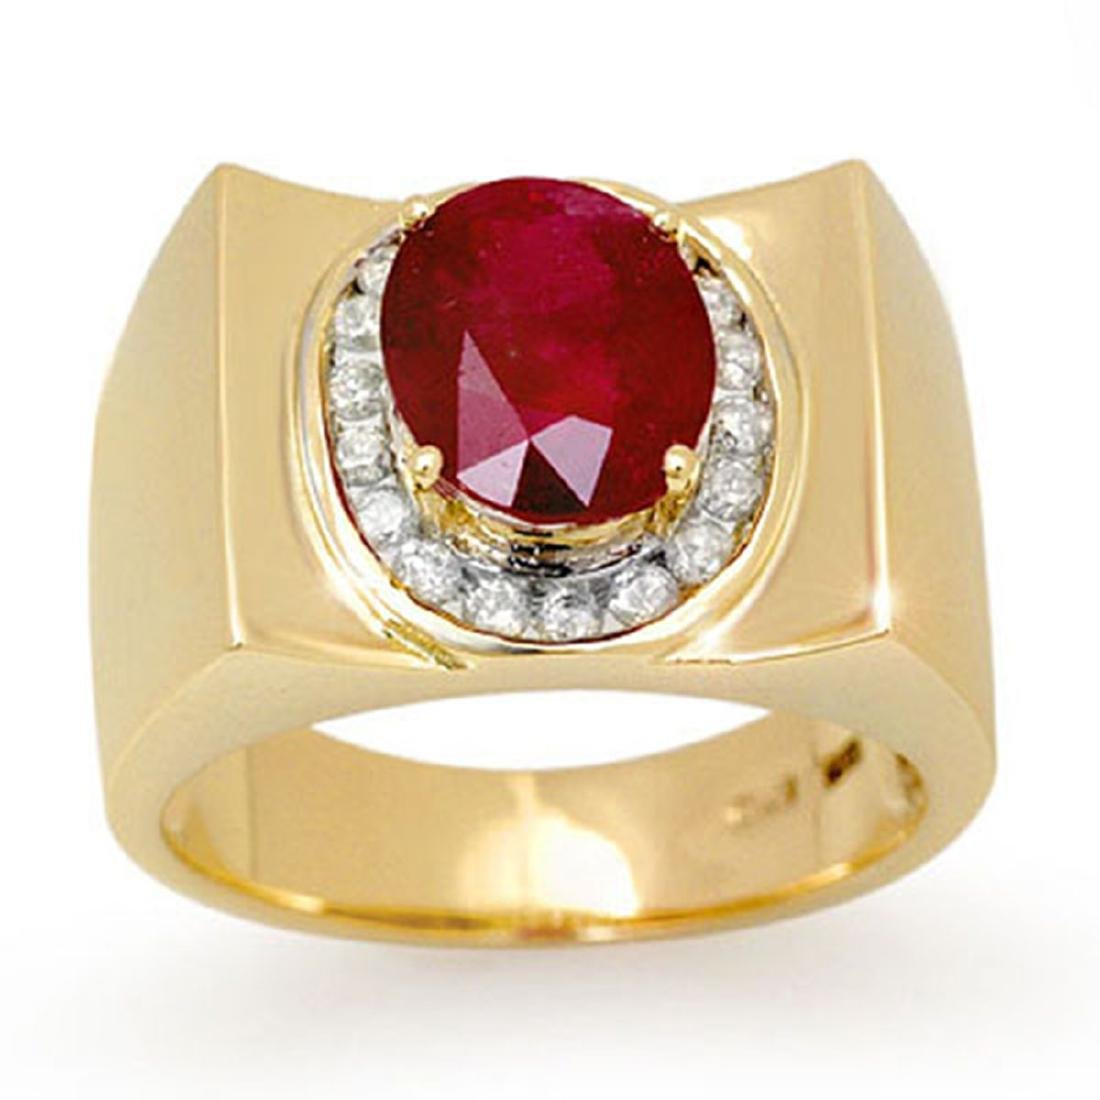 3.33 CTW Ruby & Diamond Men's Ring 10K Yellow Gold -